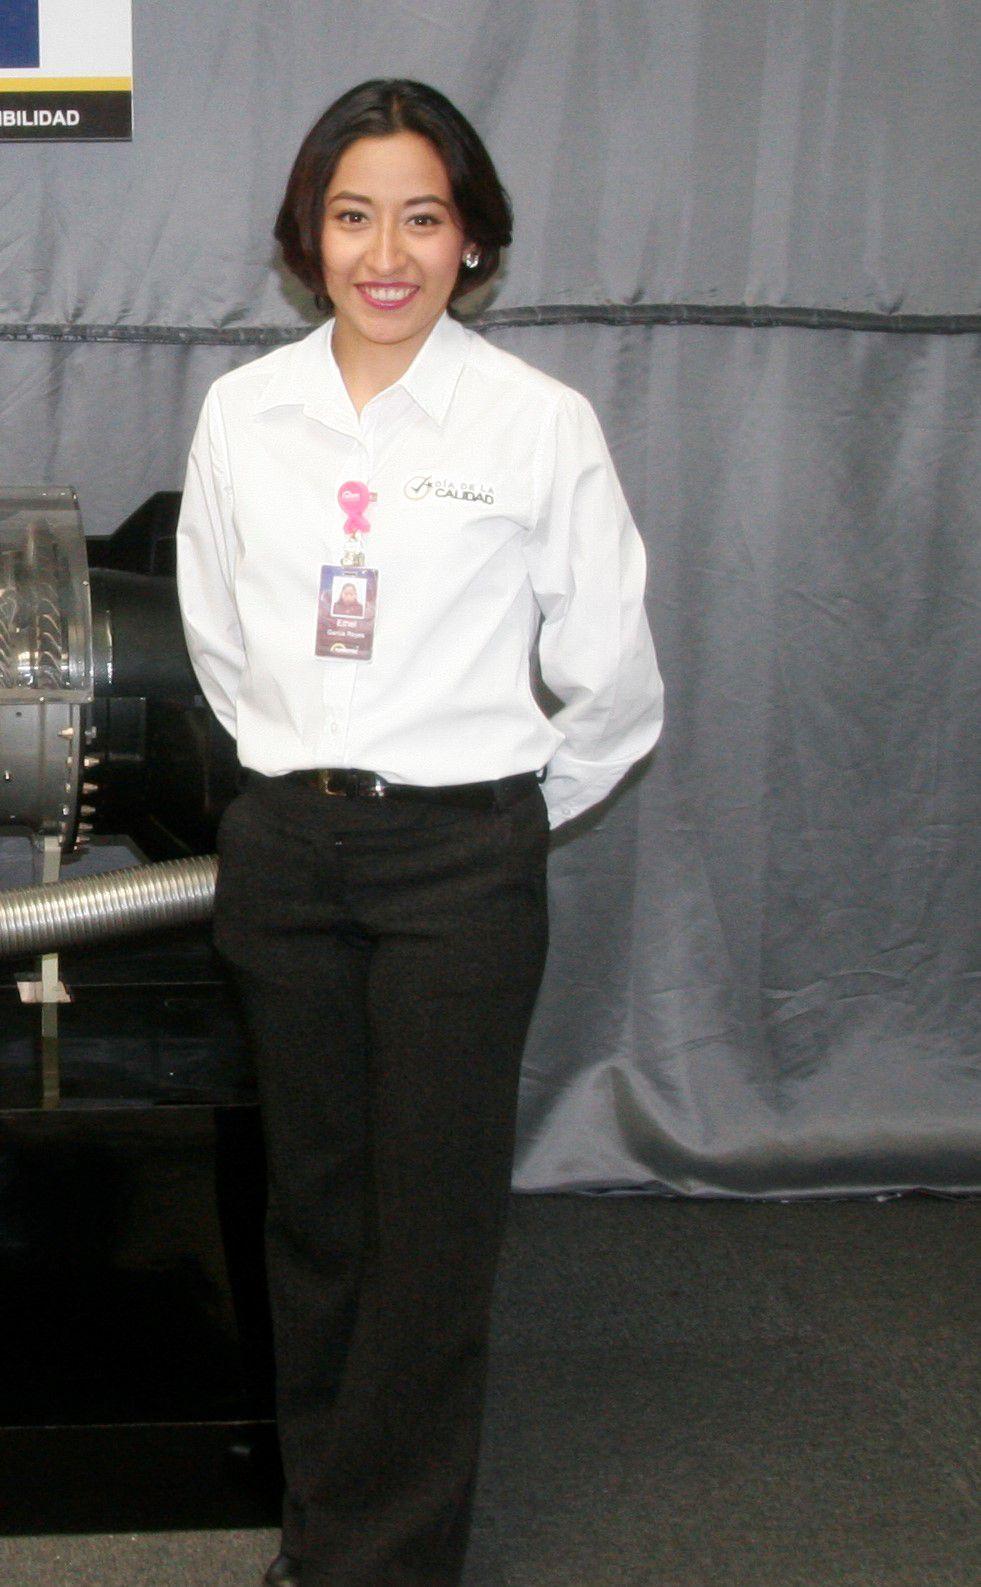 Ethel R., Supplier Development Engineer Solar Turbines